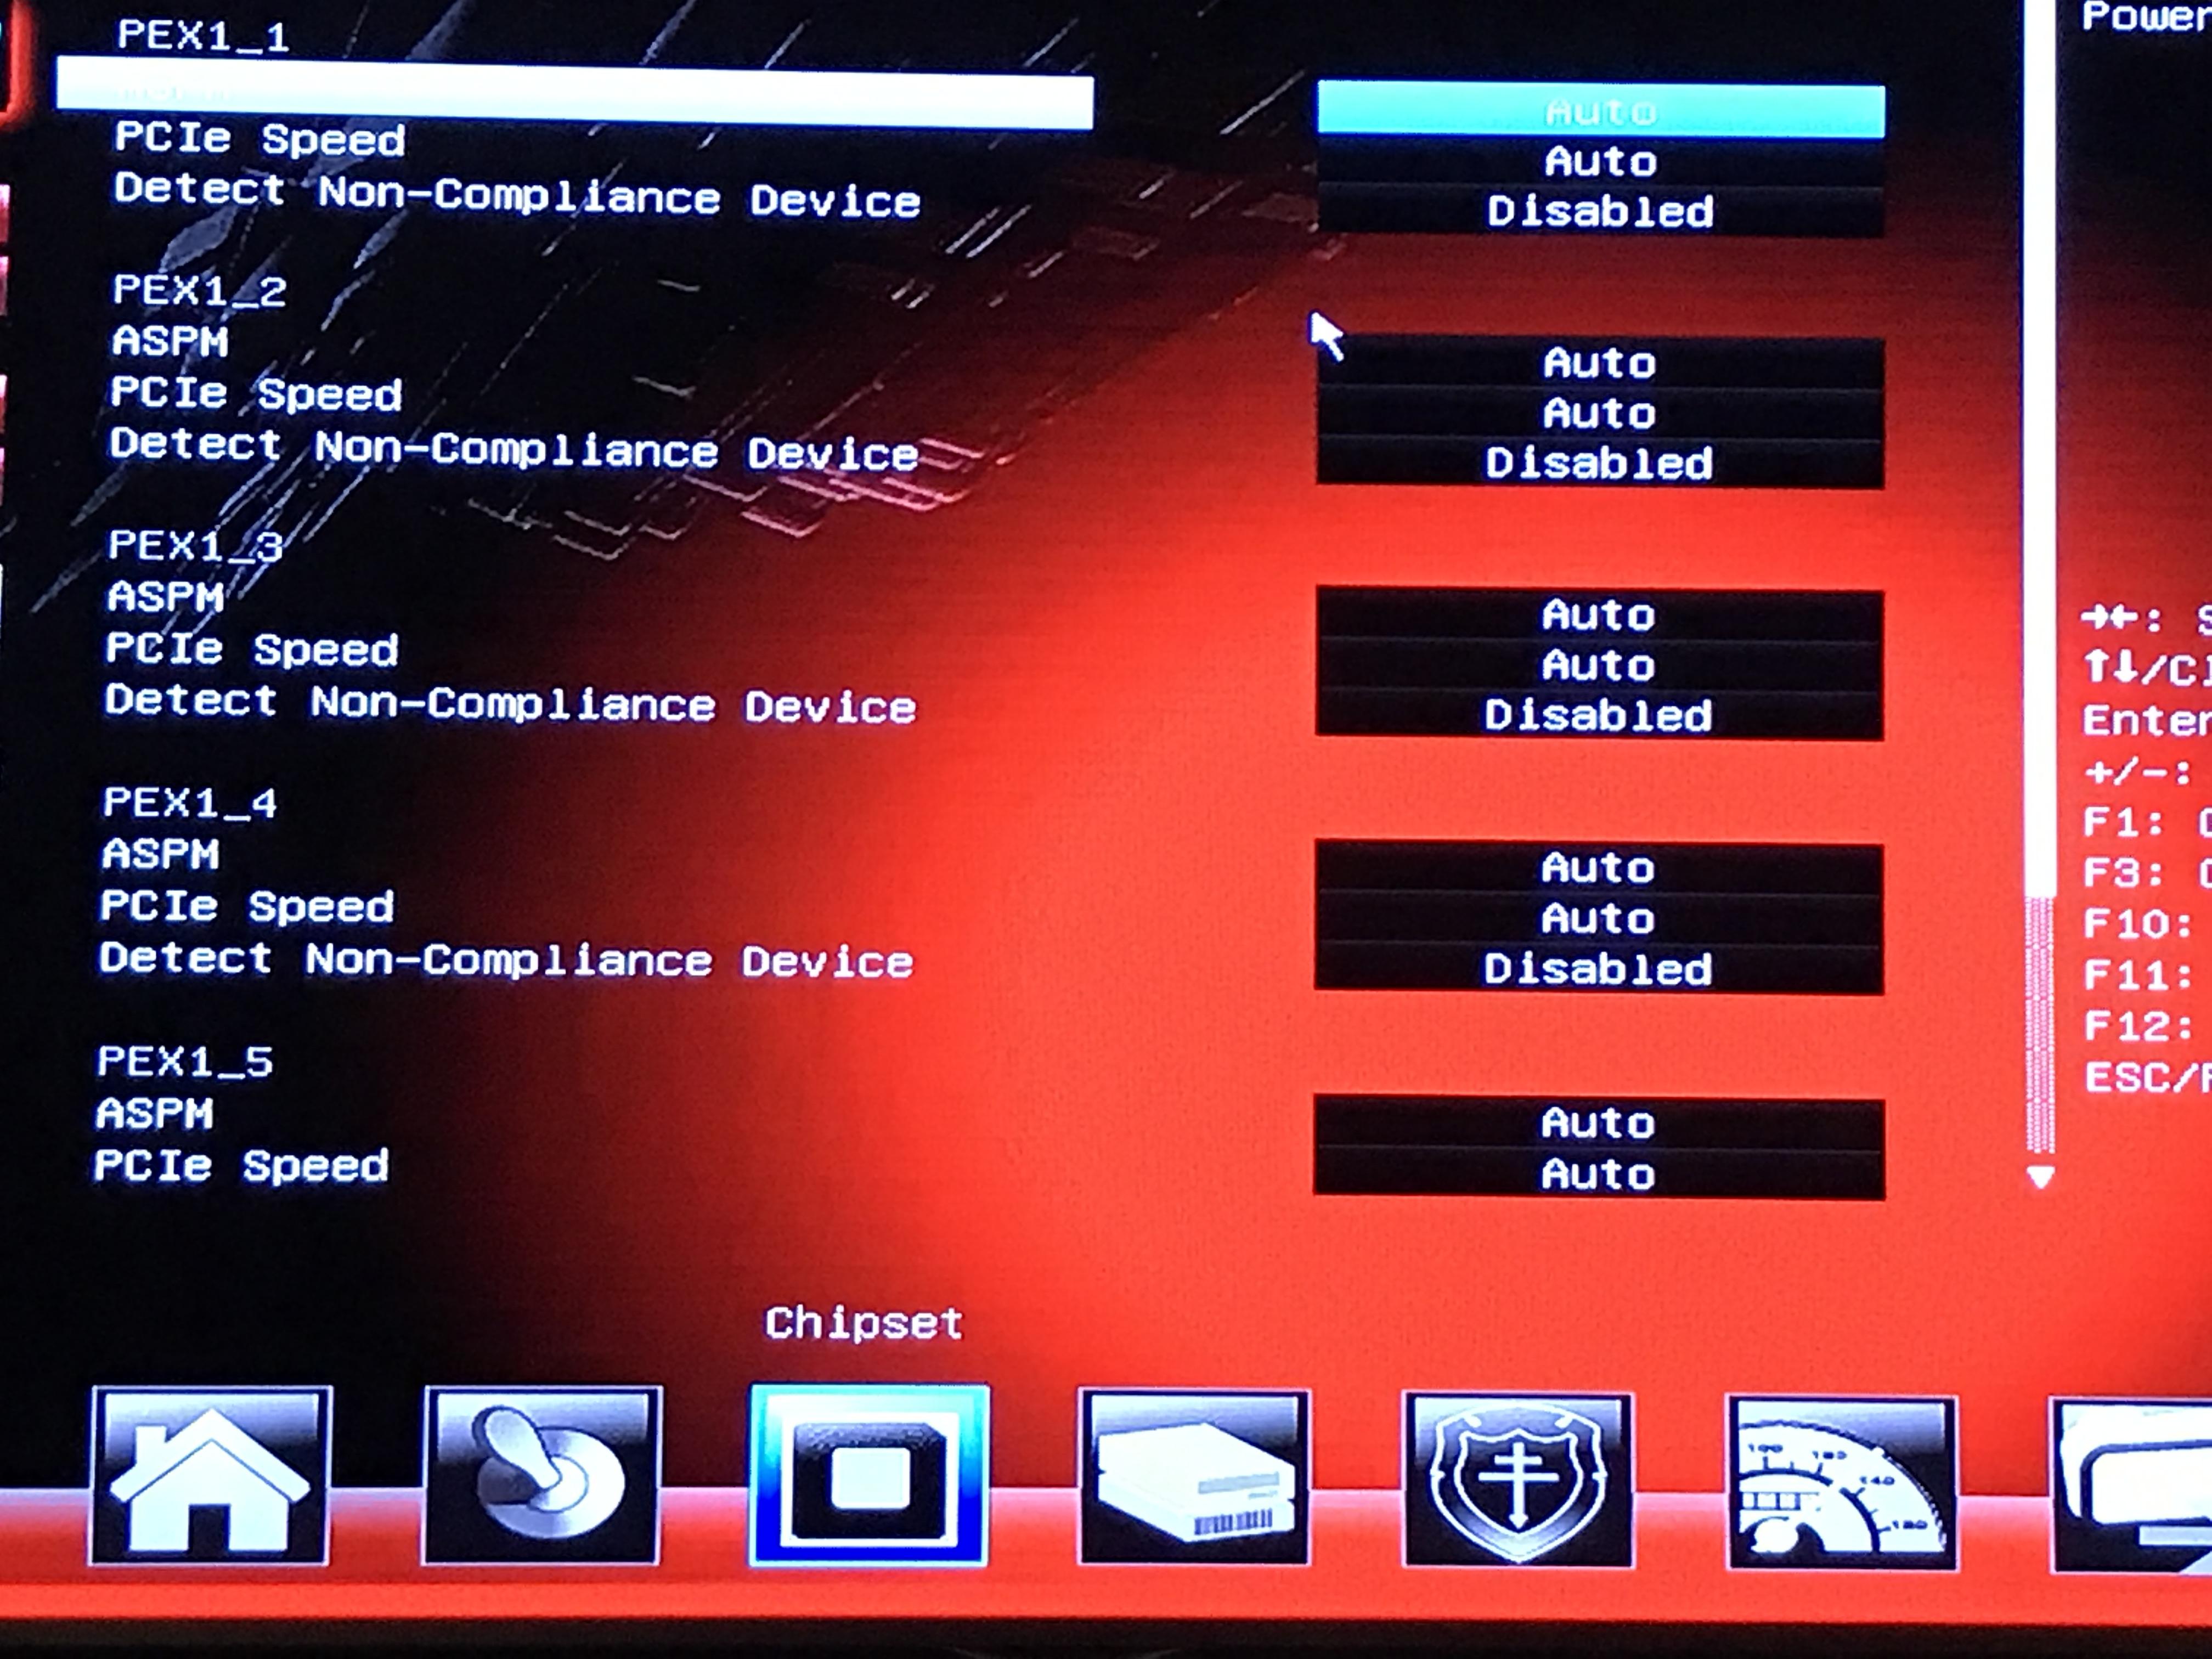 Biostar TB85 board, need BIOS help, no GPU's showing